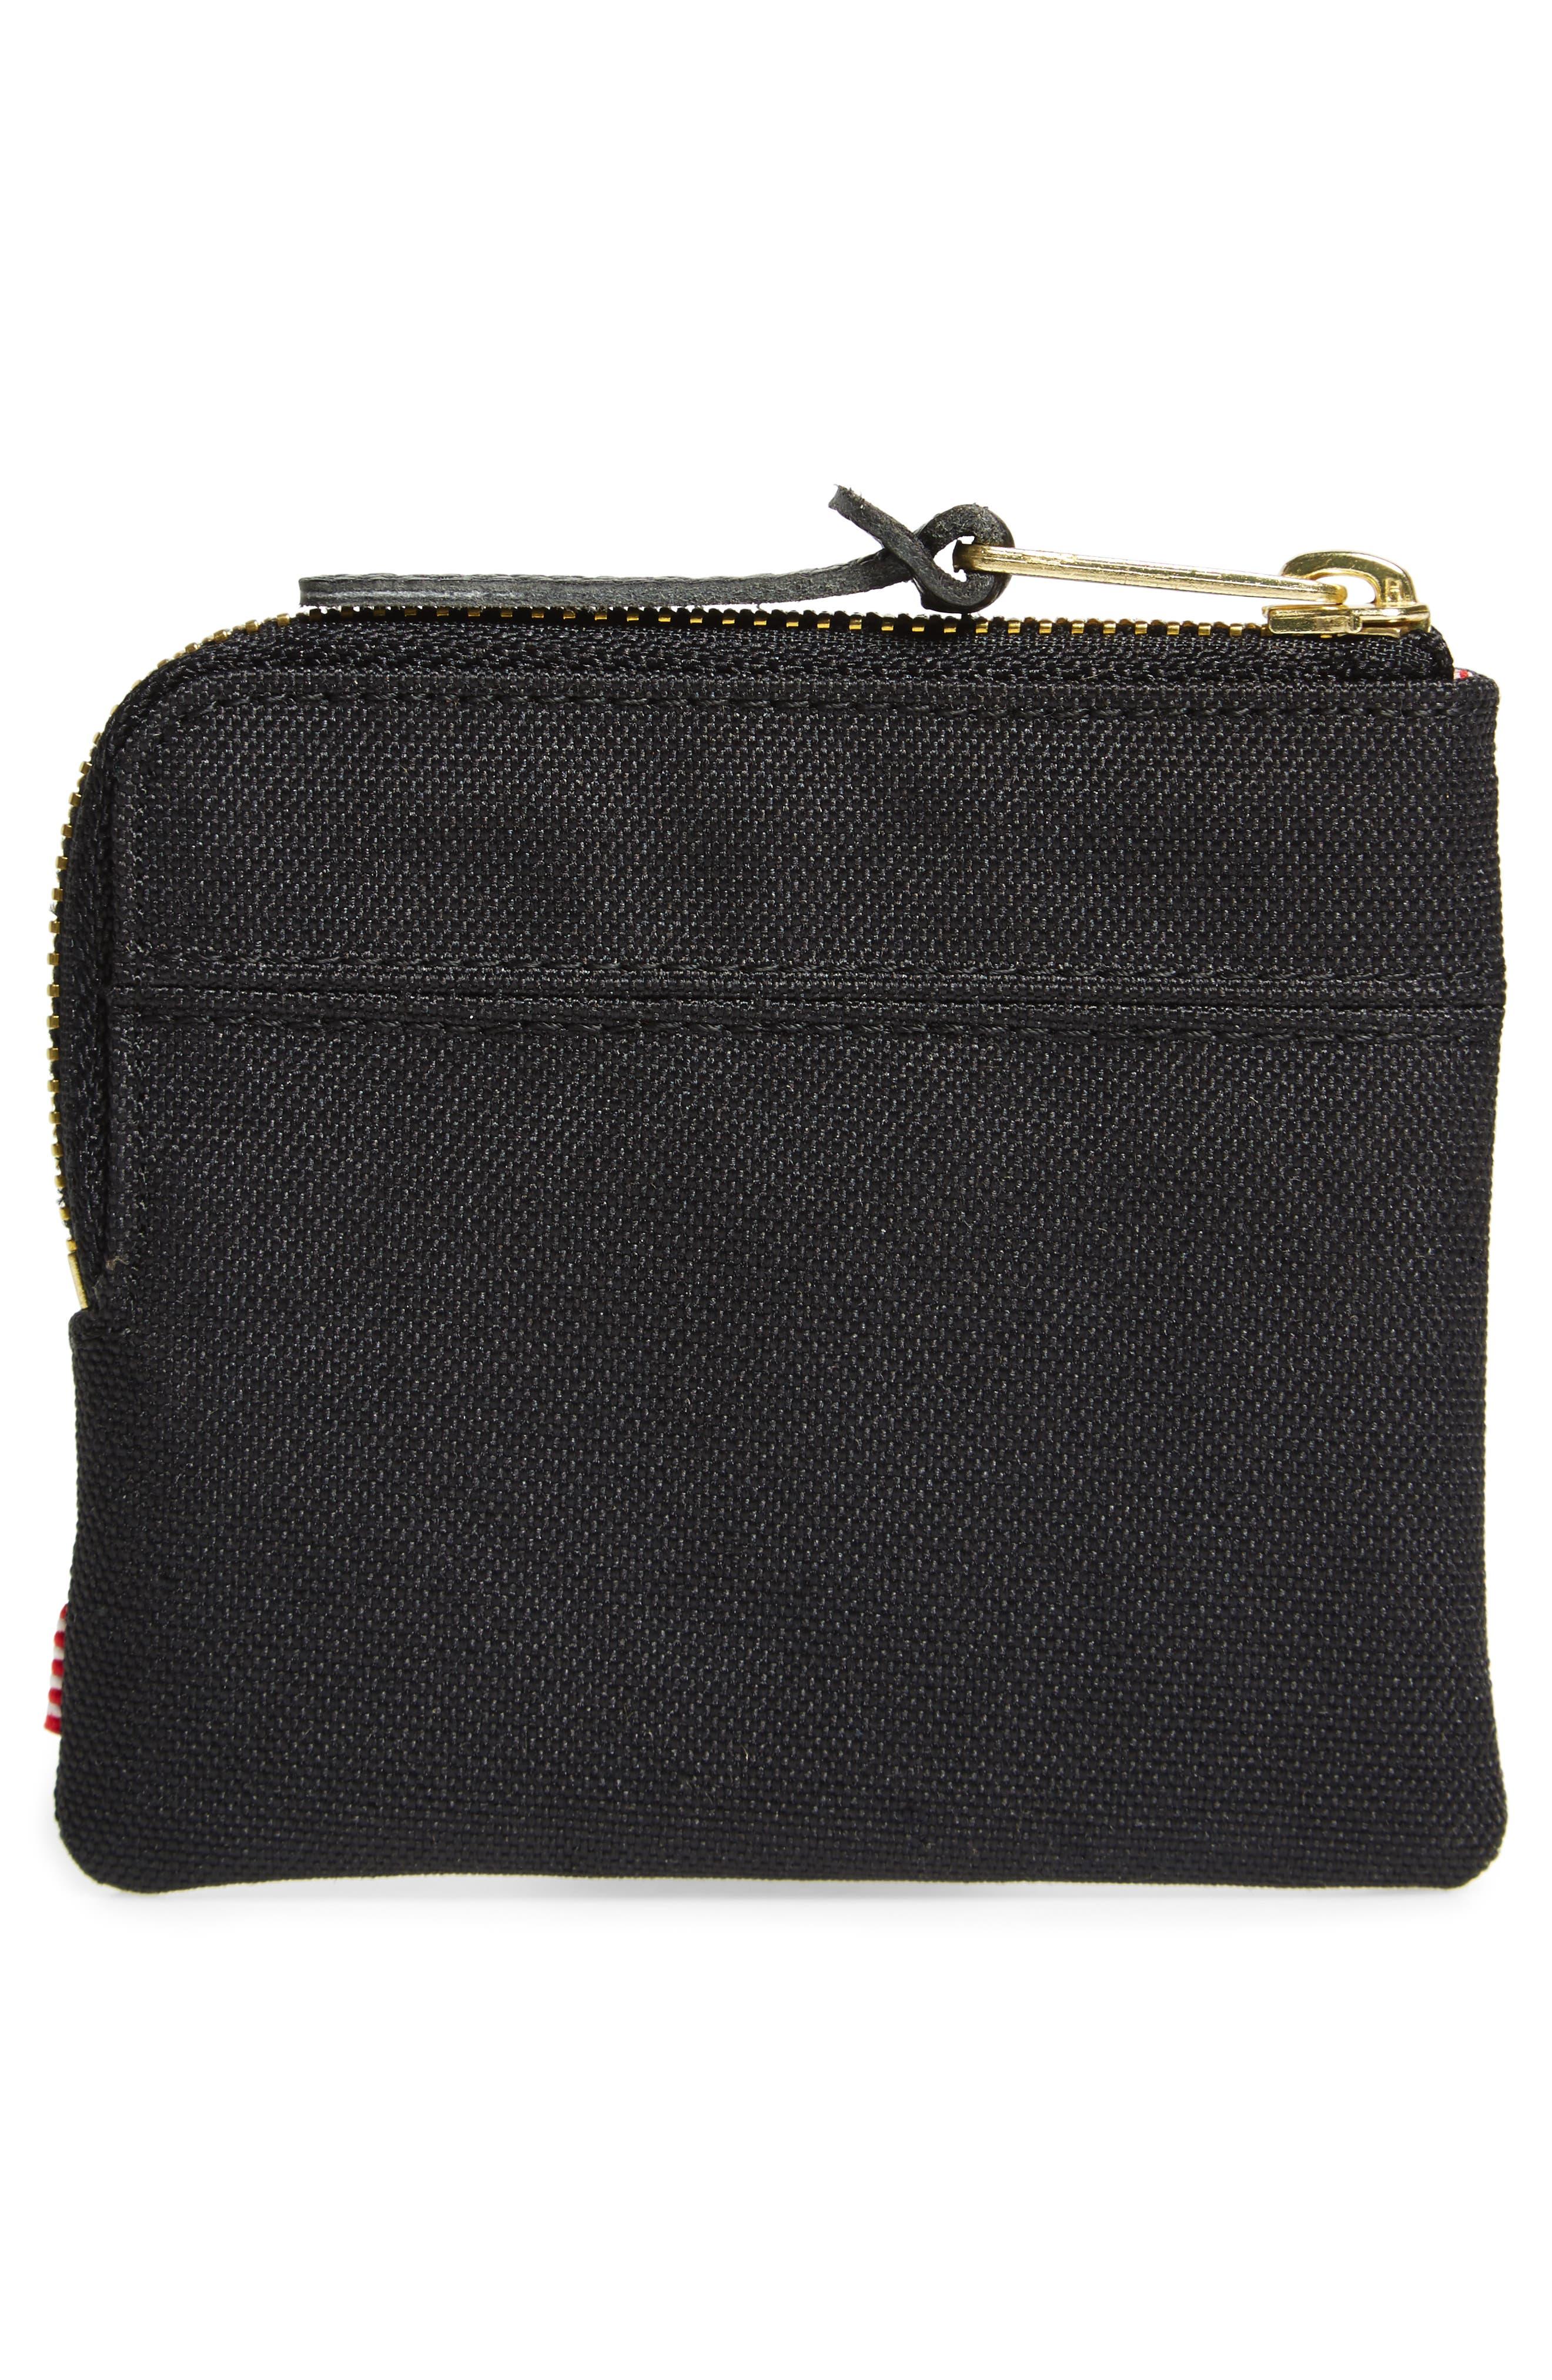 'Johnny' Half Zip Wallet,                             Alternate thumbnail 2, color,                             Black/ Black